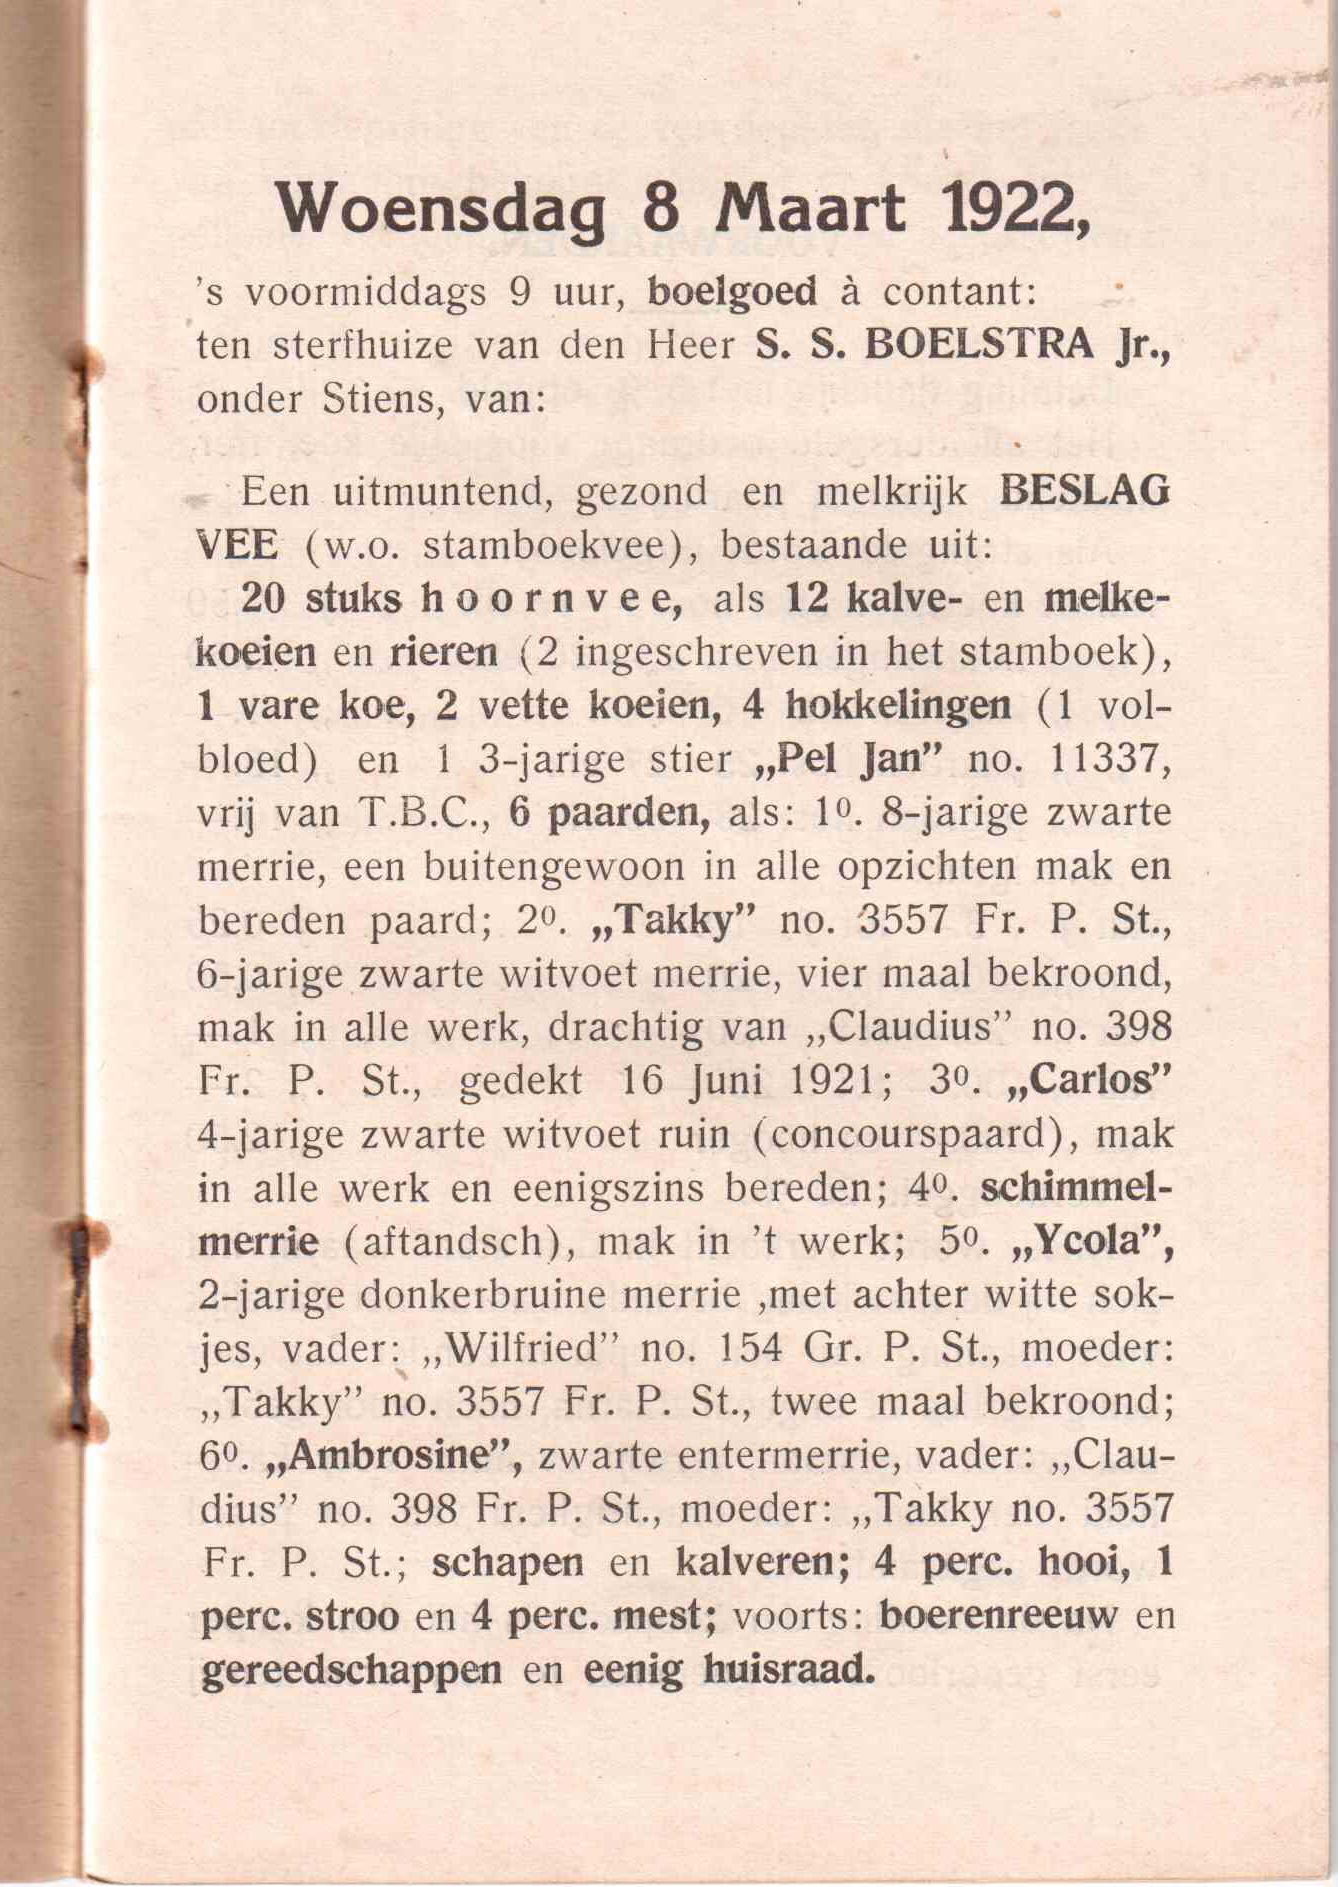 boelstra-boereboelguod-1922